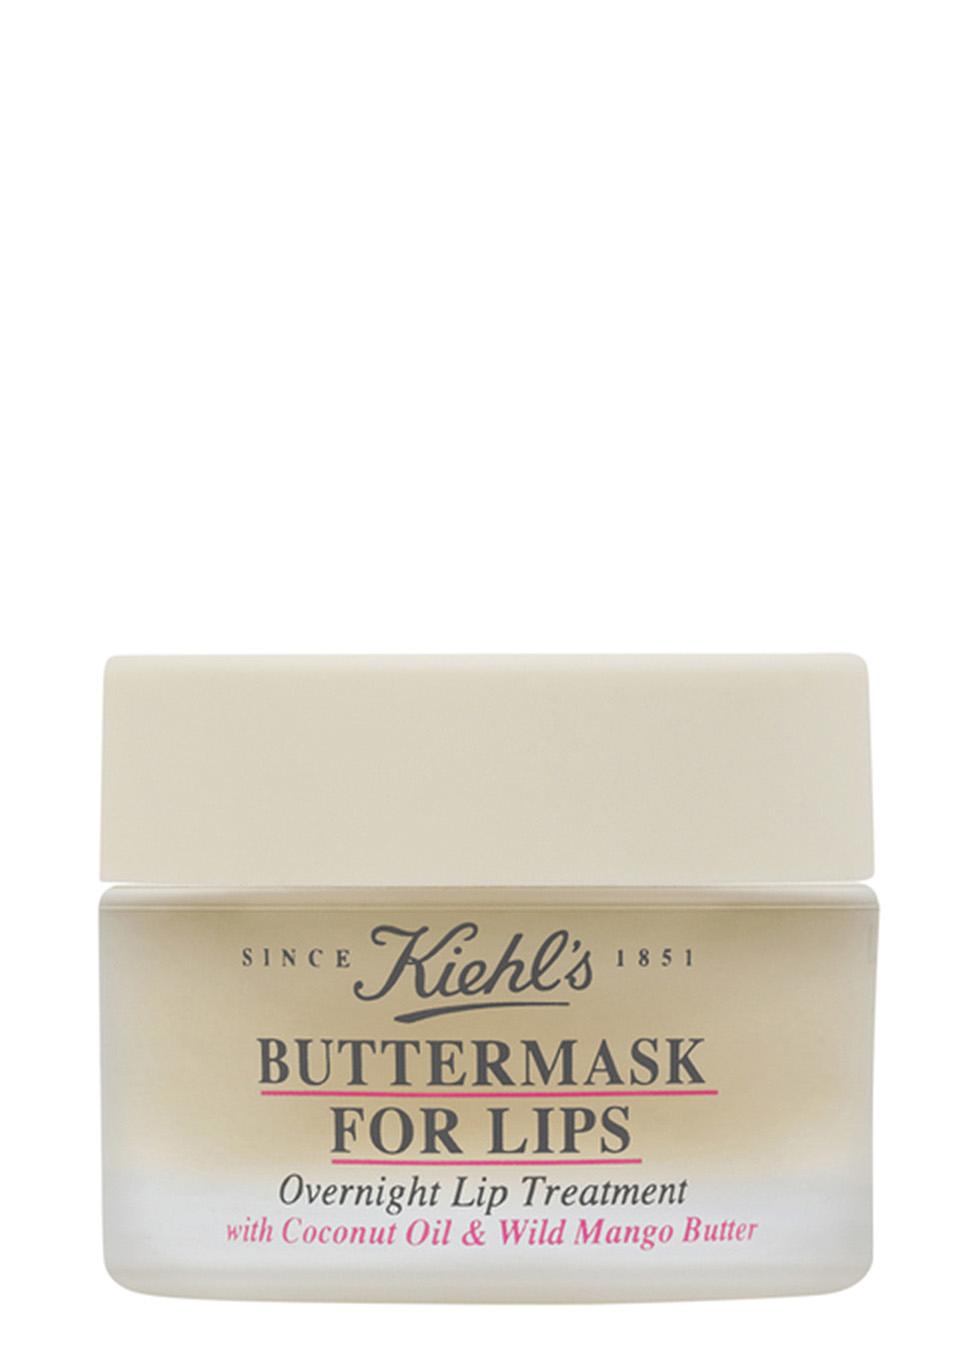 Buttermask For Lips 10g